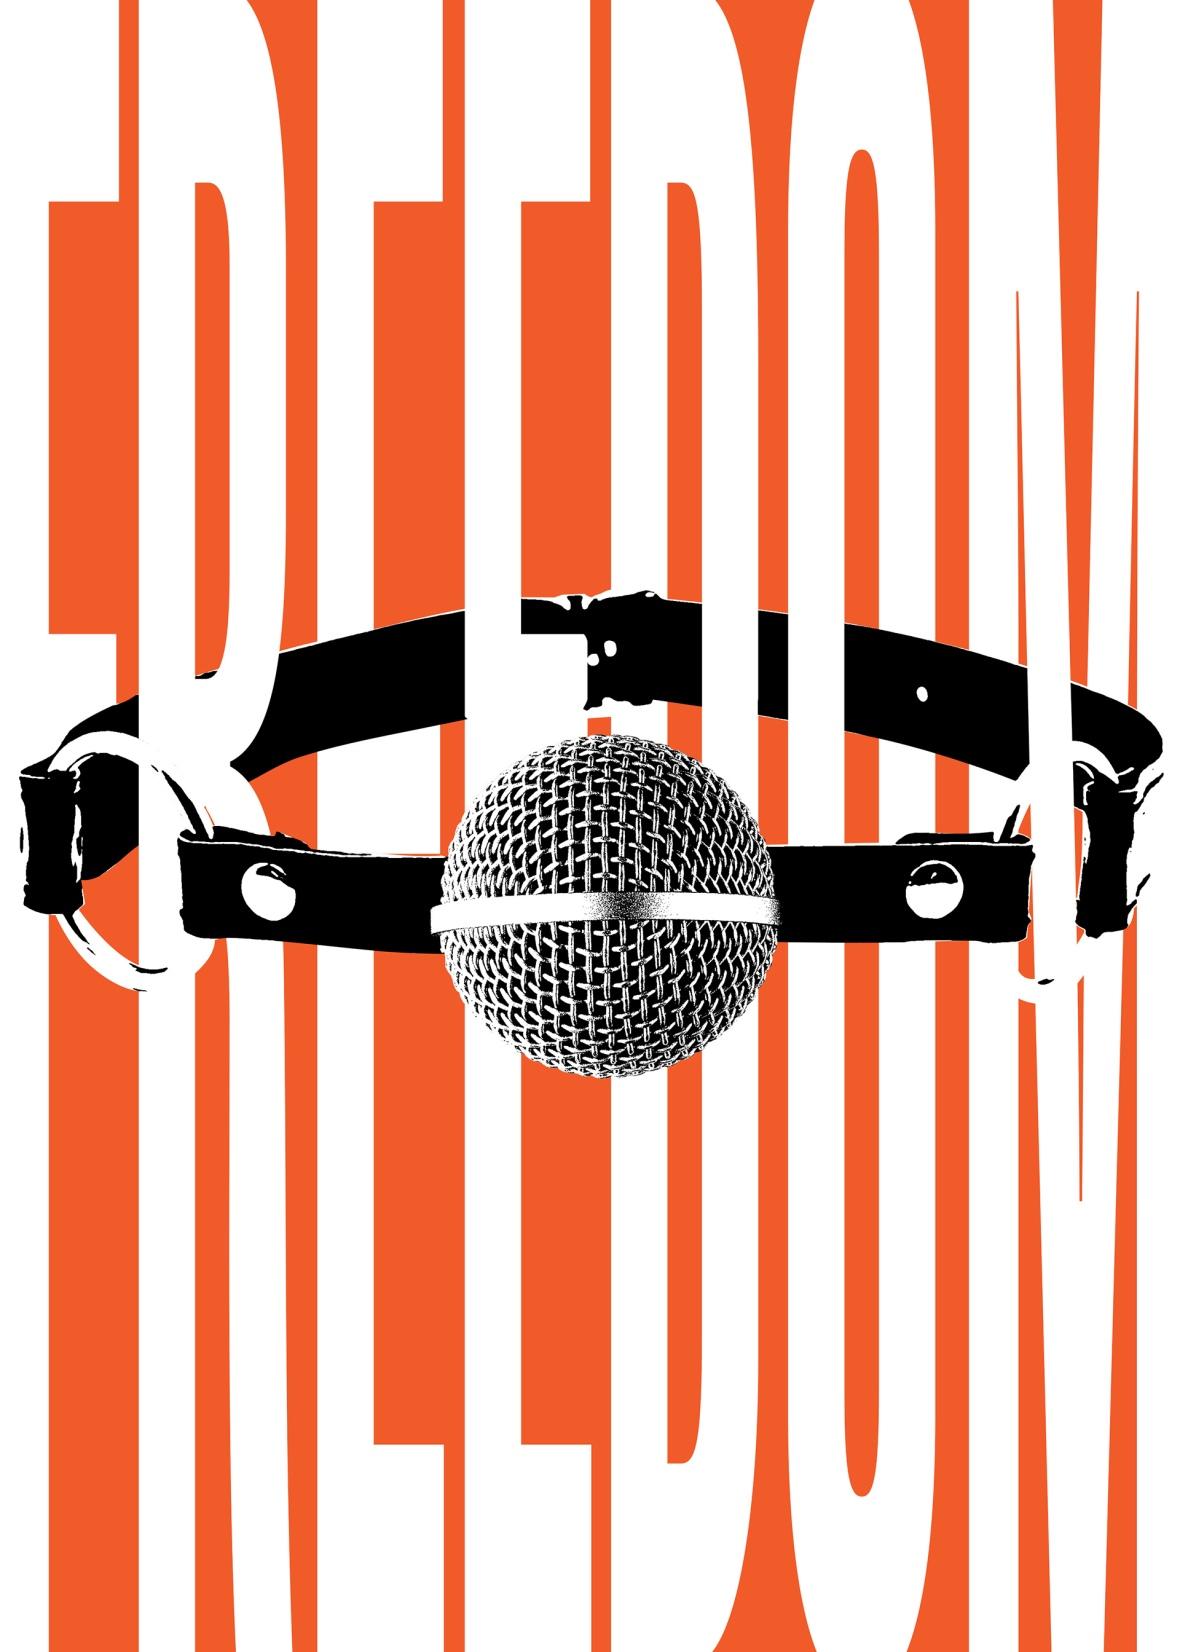 Ball mic - Santiago Gómez